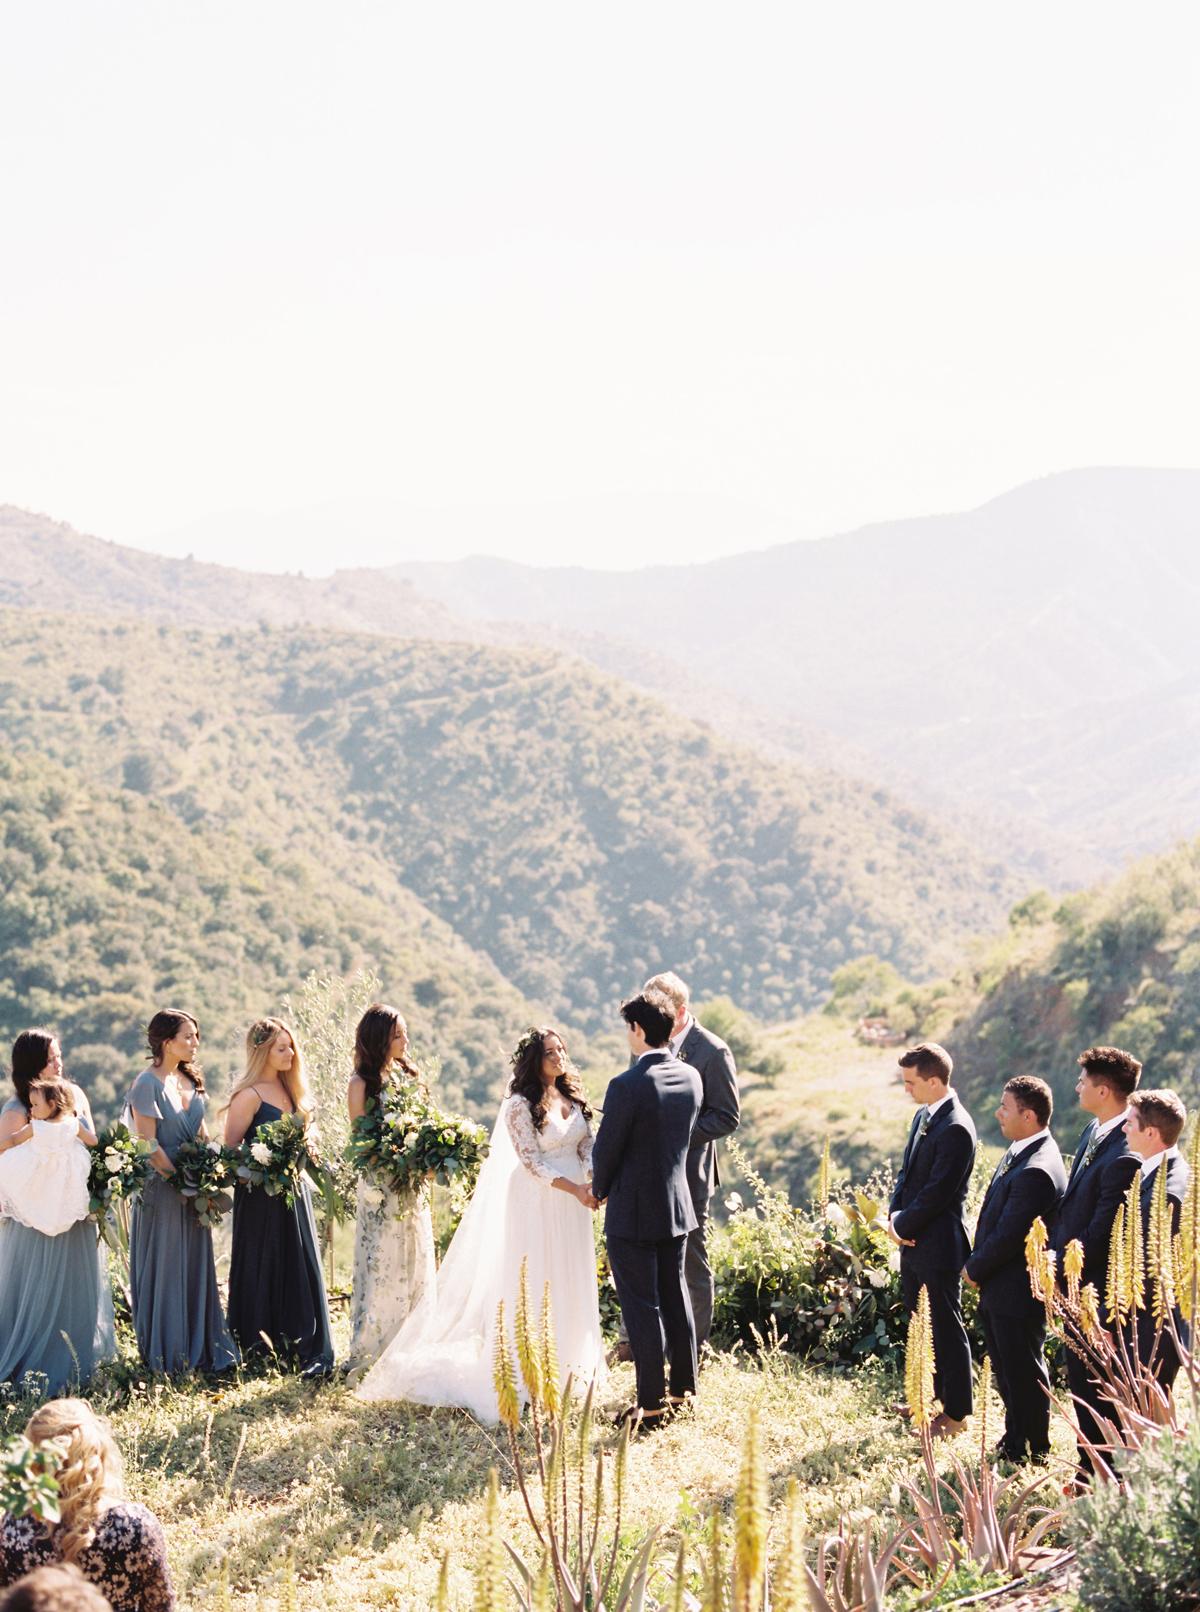 daphne jack wedding spain ceremony on mountains